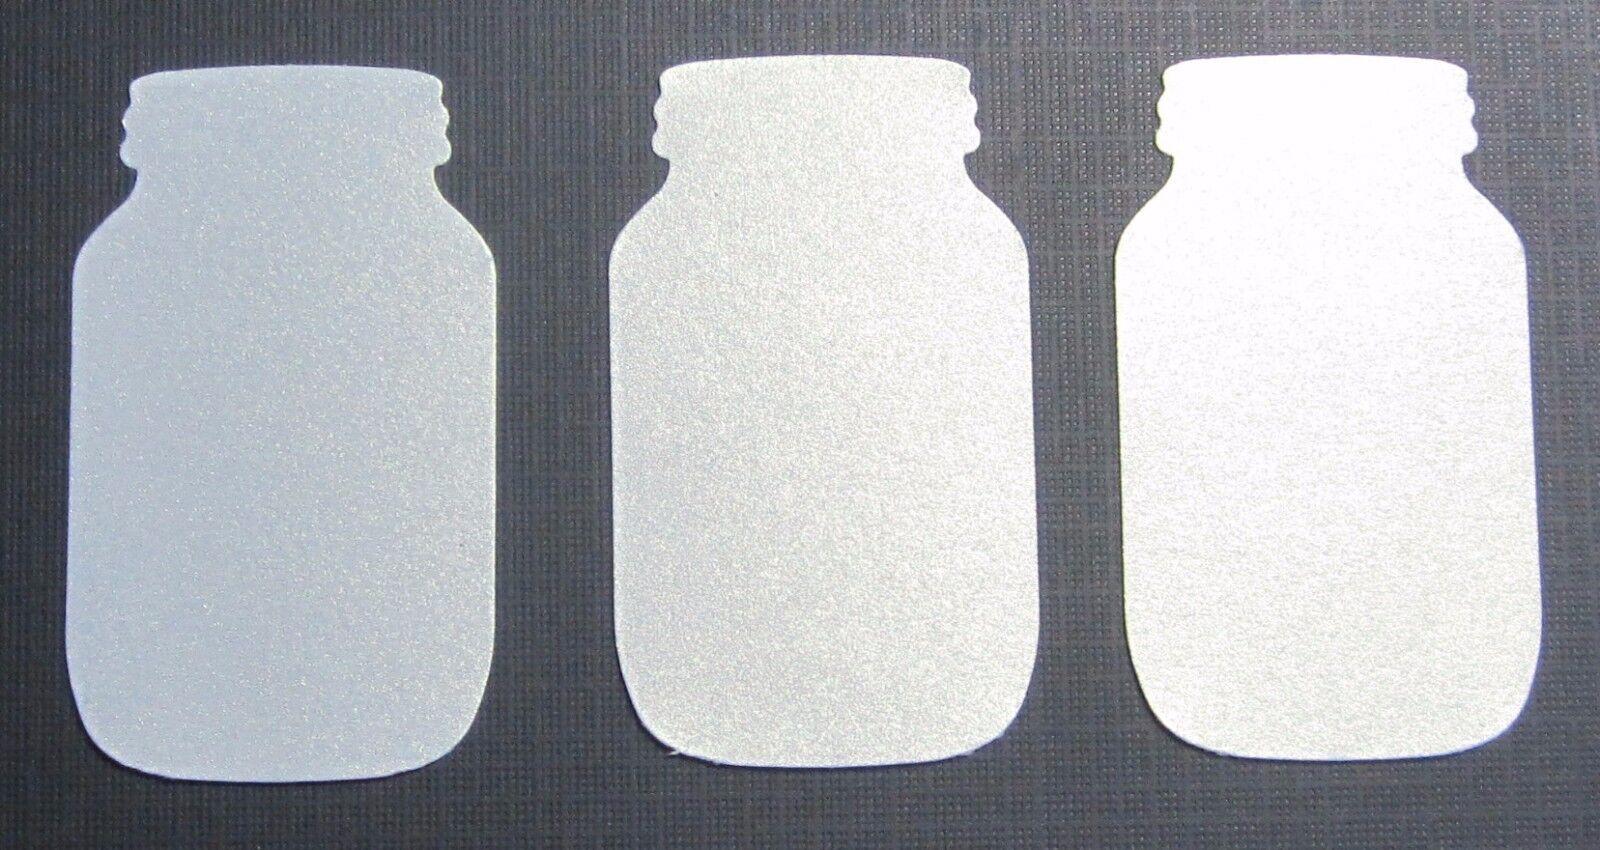 Groß Dose Stanze Ausschnitte Punch-Outs Papier Teile U-Pick Set Menge von 24